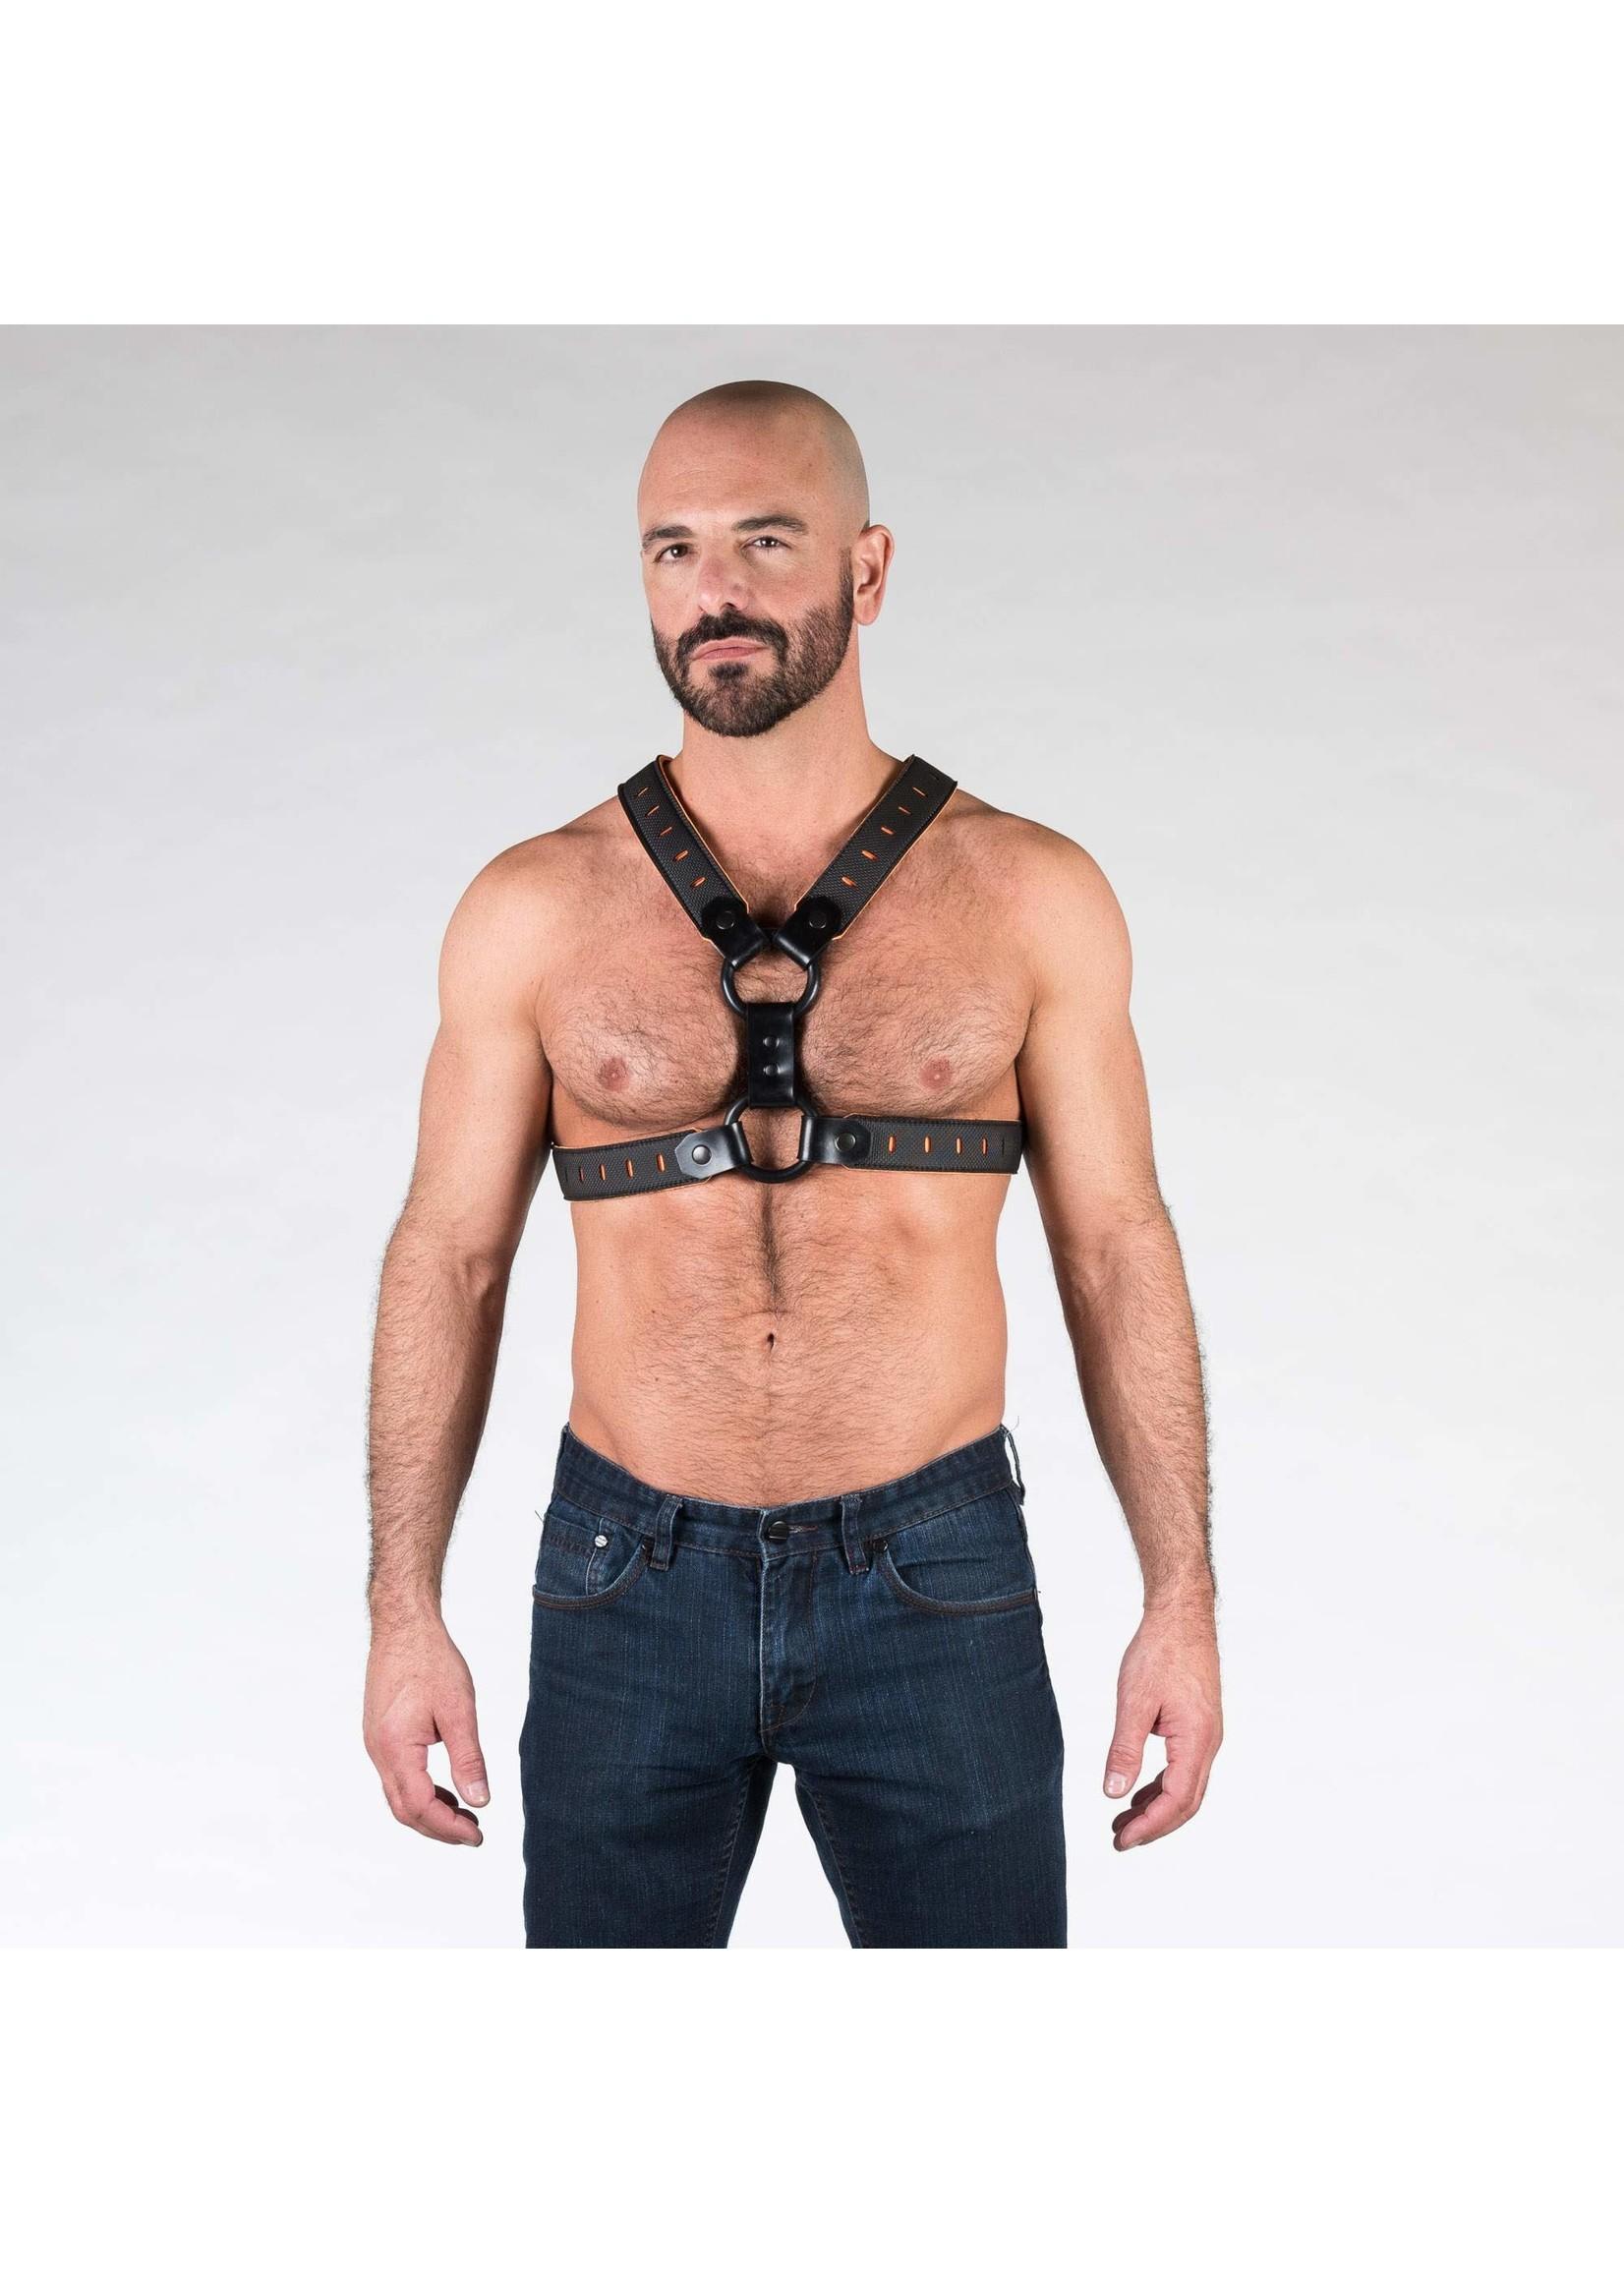 665 Leather 665 NeoFlex Neoprene Harness